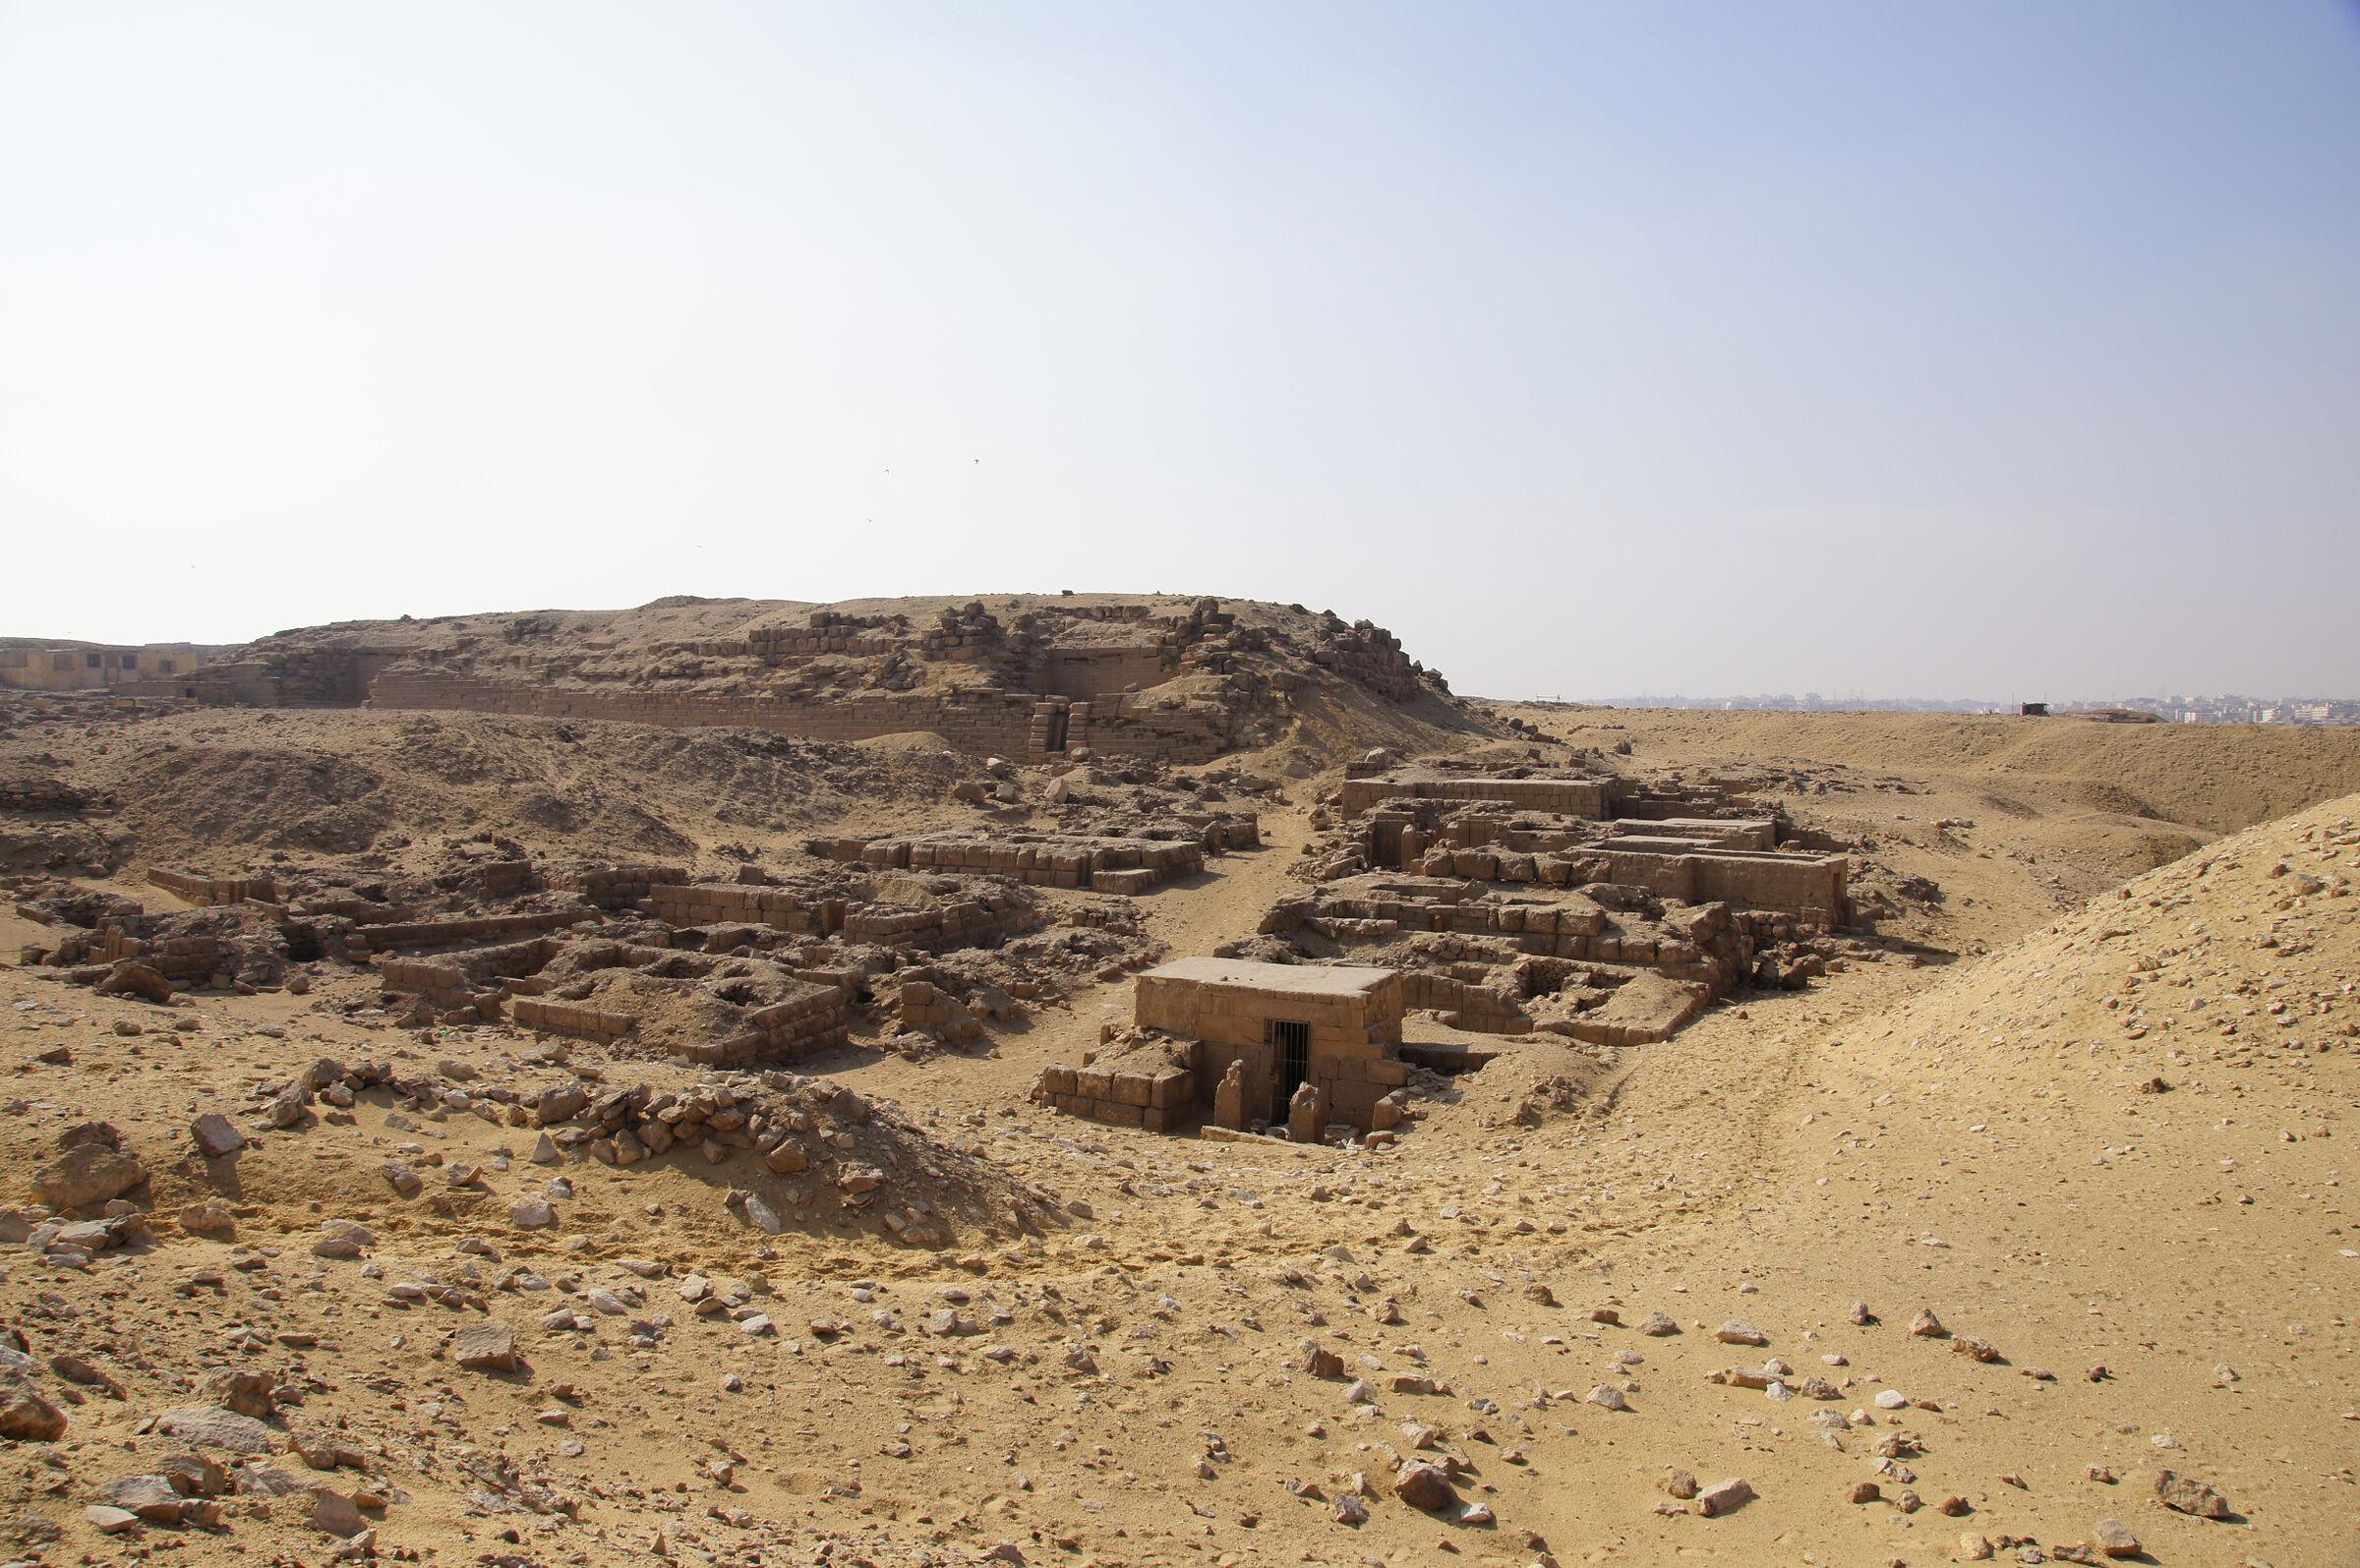 Western Cemetery: Site: Giza; View: G 2240, G 2230+2231, G 2084, G 2085, G 2086, G 2087, G 2099, G 2088, G 2098, G 2089, G 2091, G 2097, G 2246, G 2243, G 2244, G 2239, G 2242, G 2241, G 2238, G 2233, G 2237, G 2232, G 2236, G 2235, G 2234, G 2061, G 2071, G 2072, G 2000